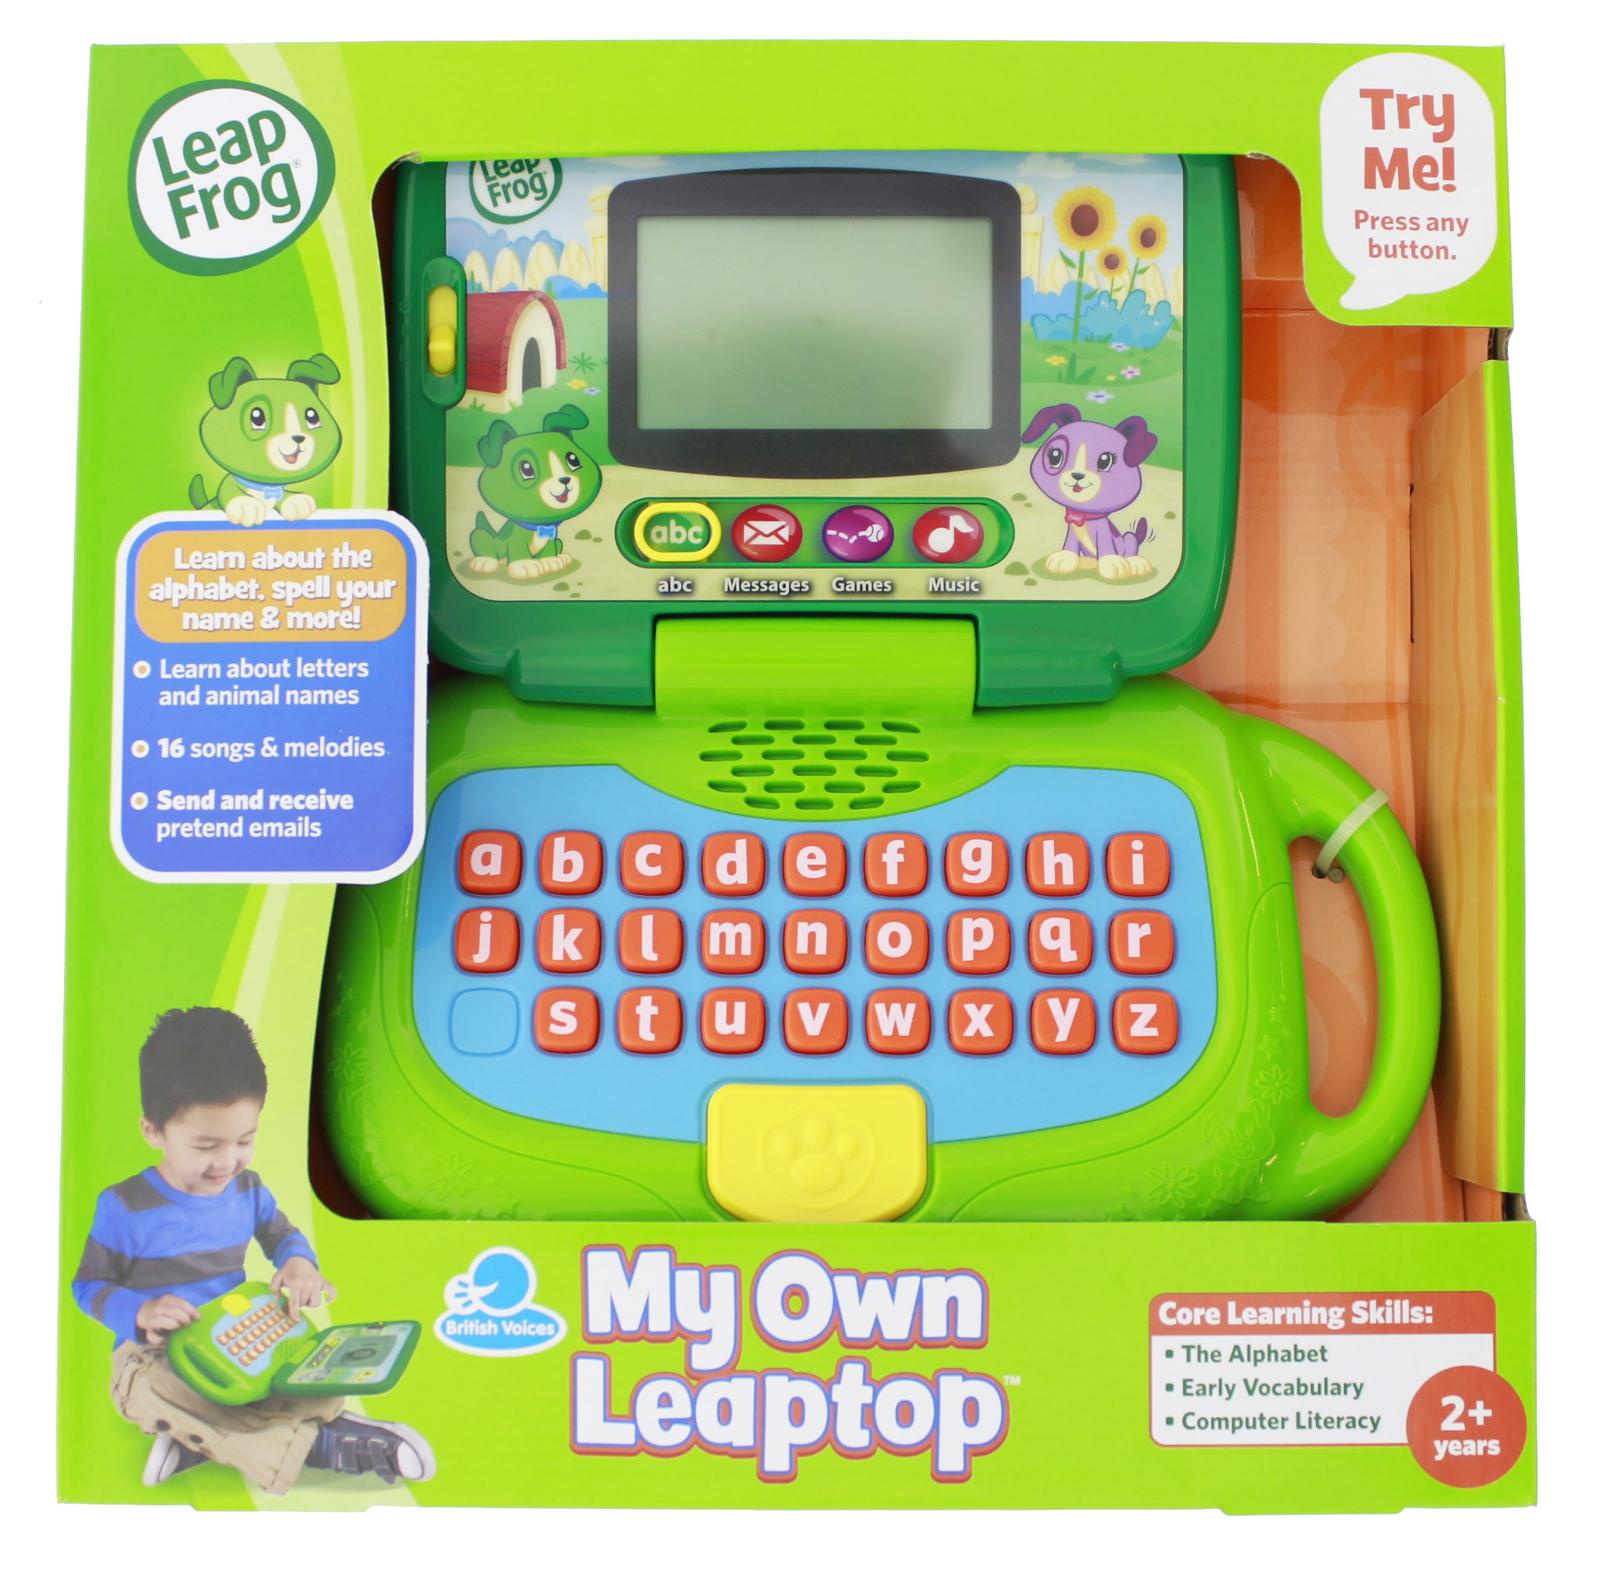 Leapfrog My Own Leaptop image